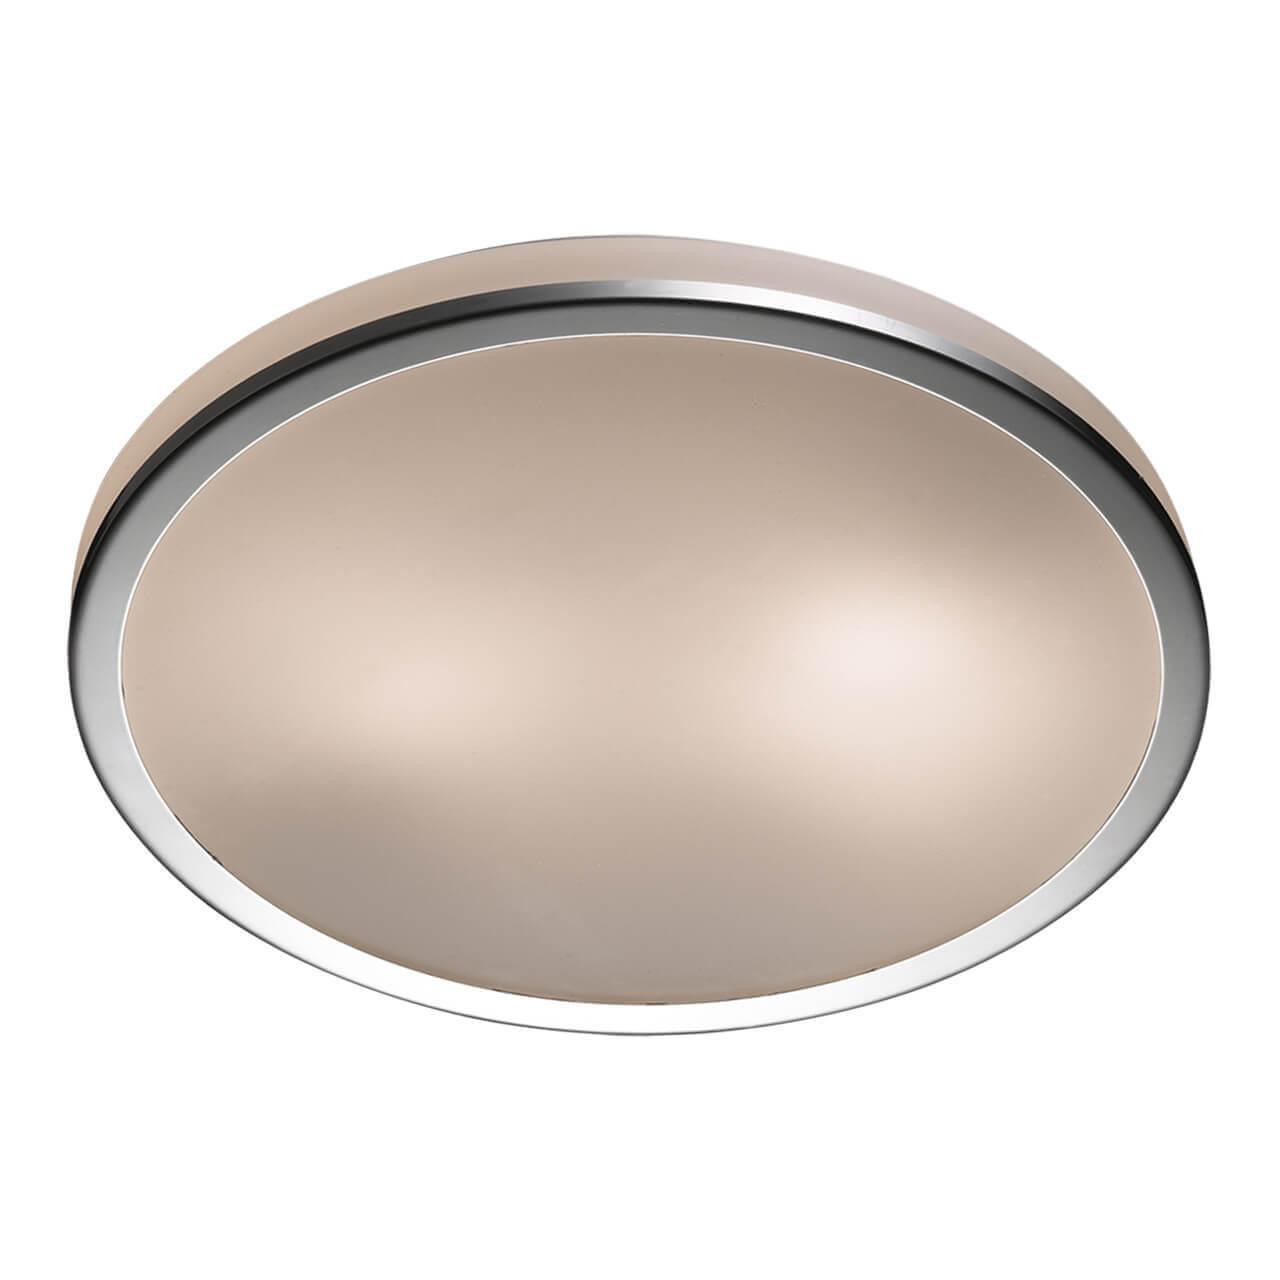 цена Светильник Odeon Light 2177/2C Drops онлайн в 2017 году